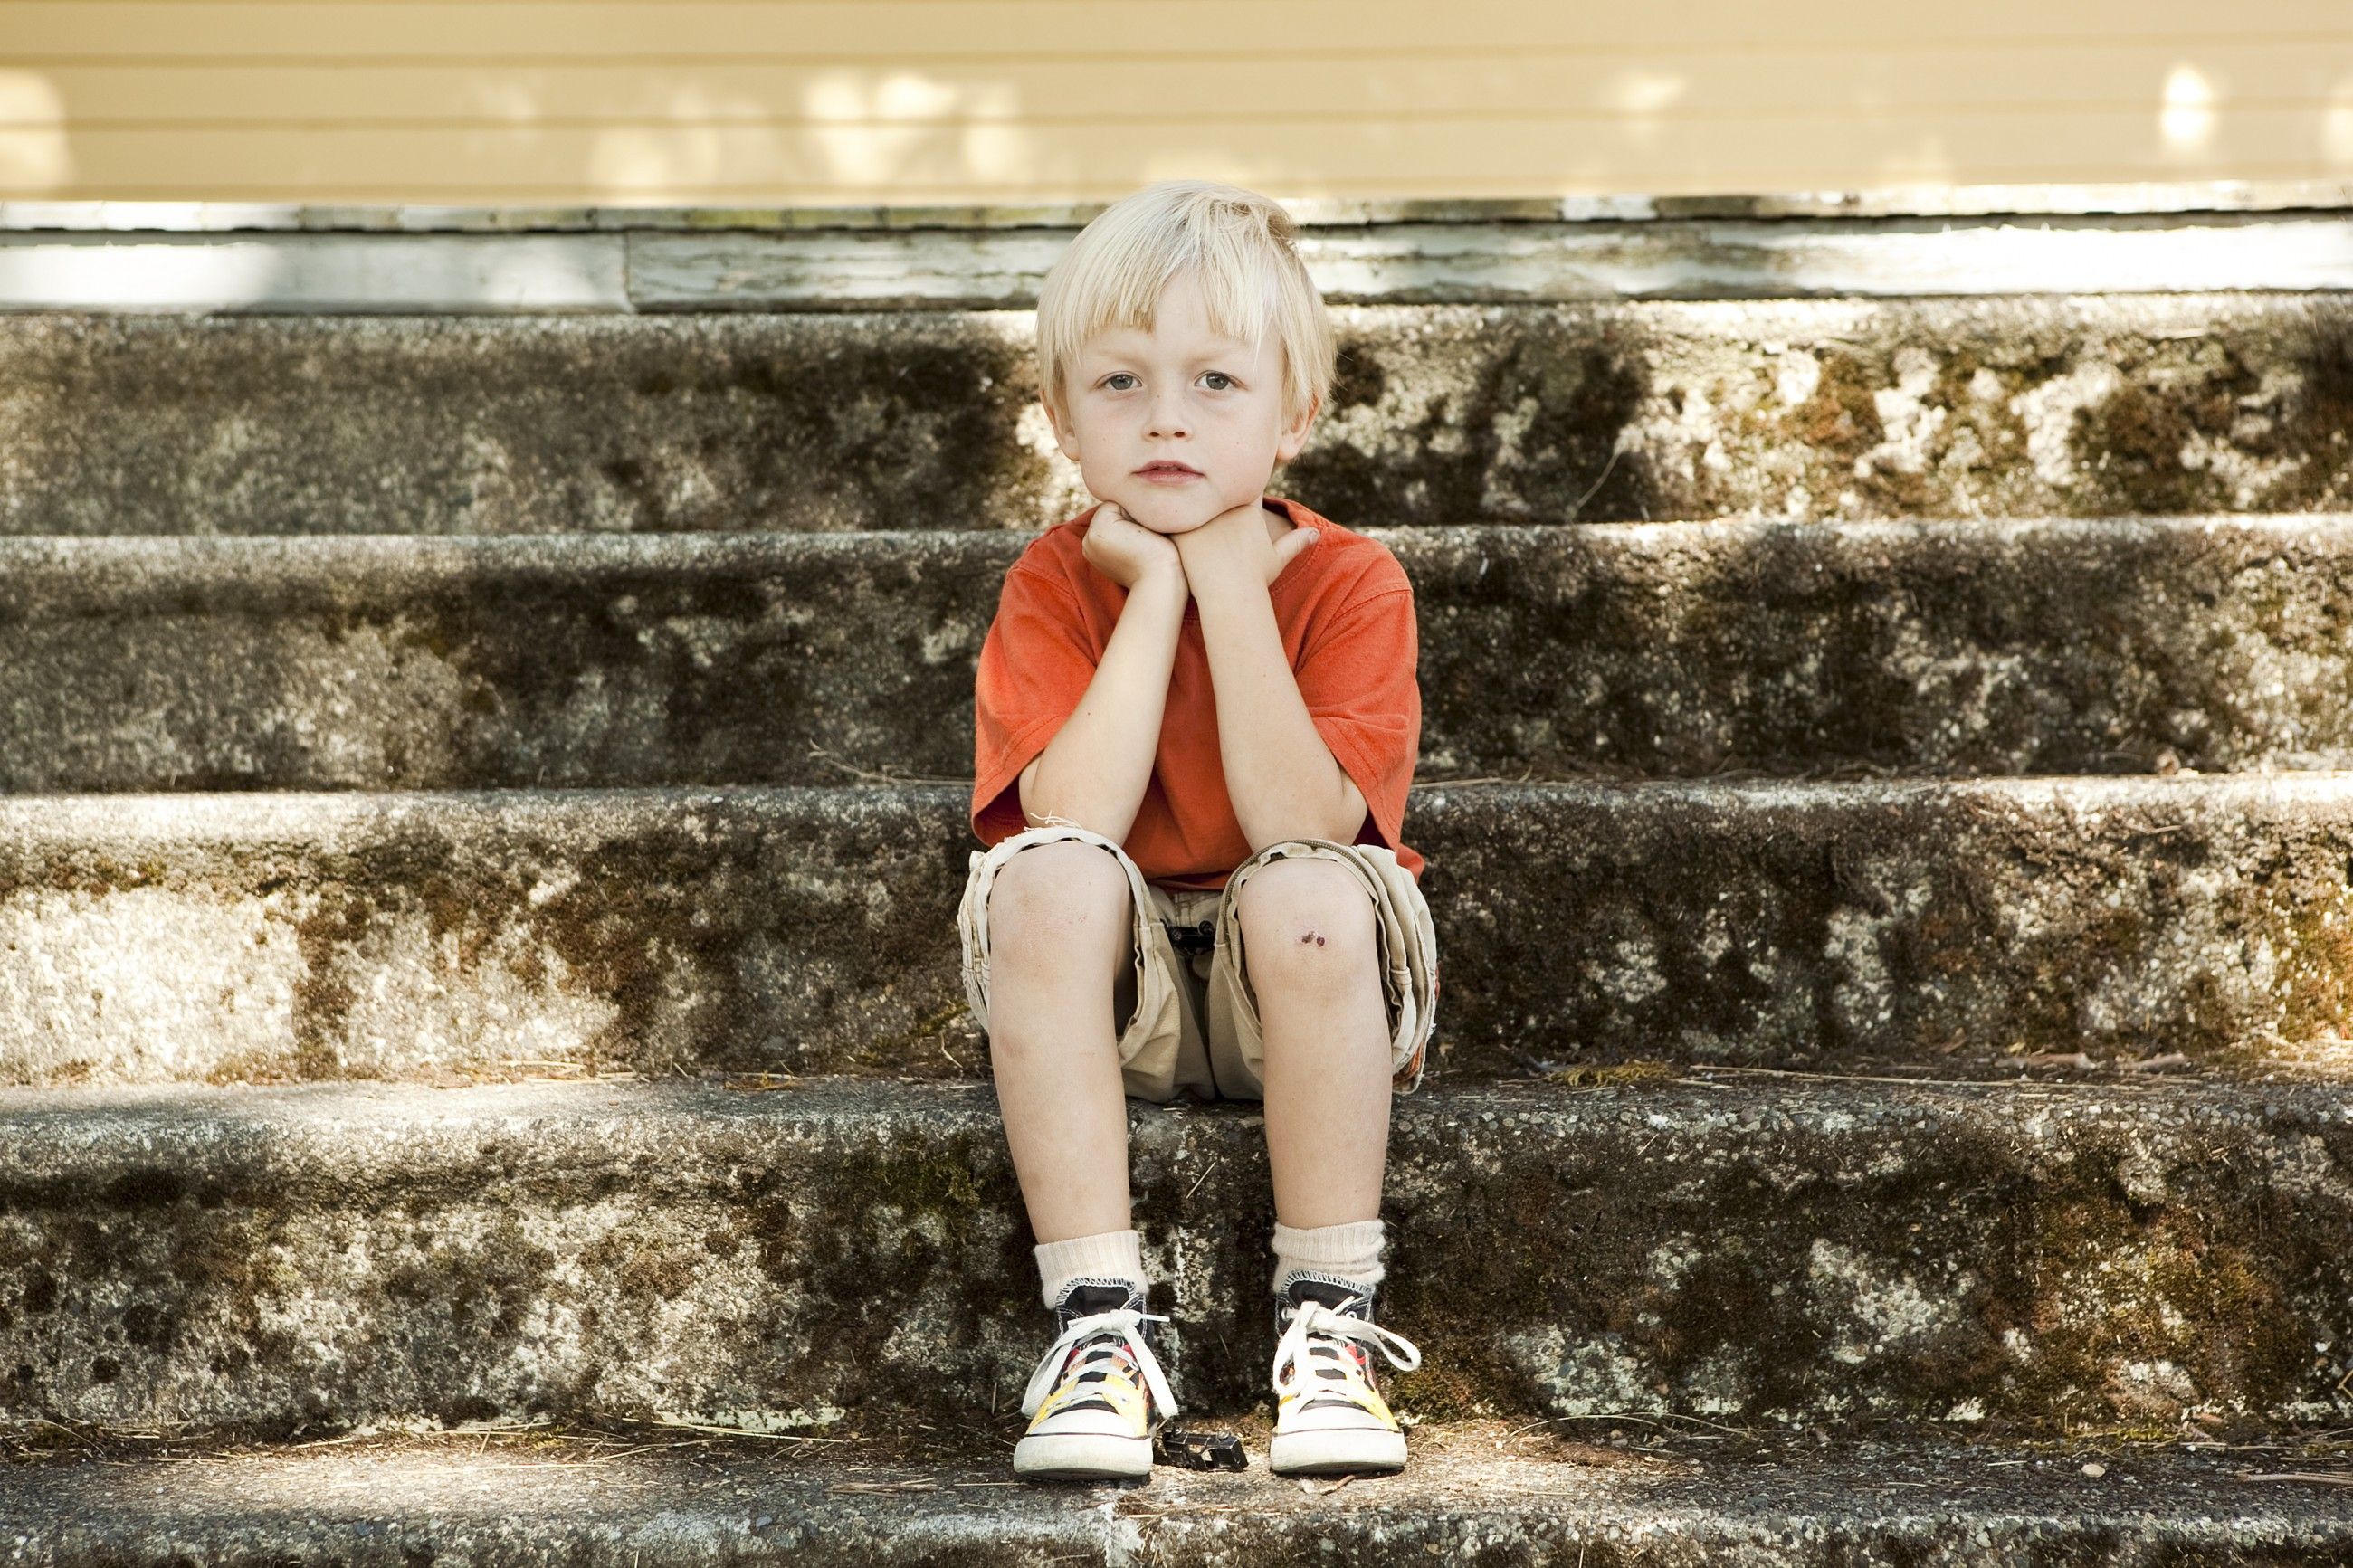 CASA boy on steps